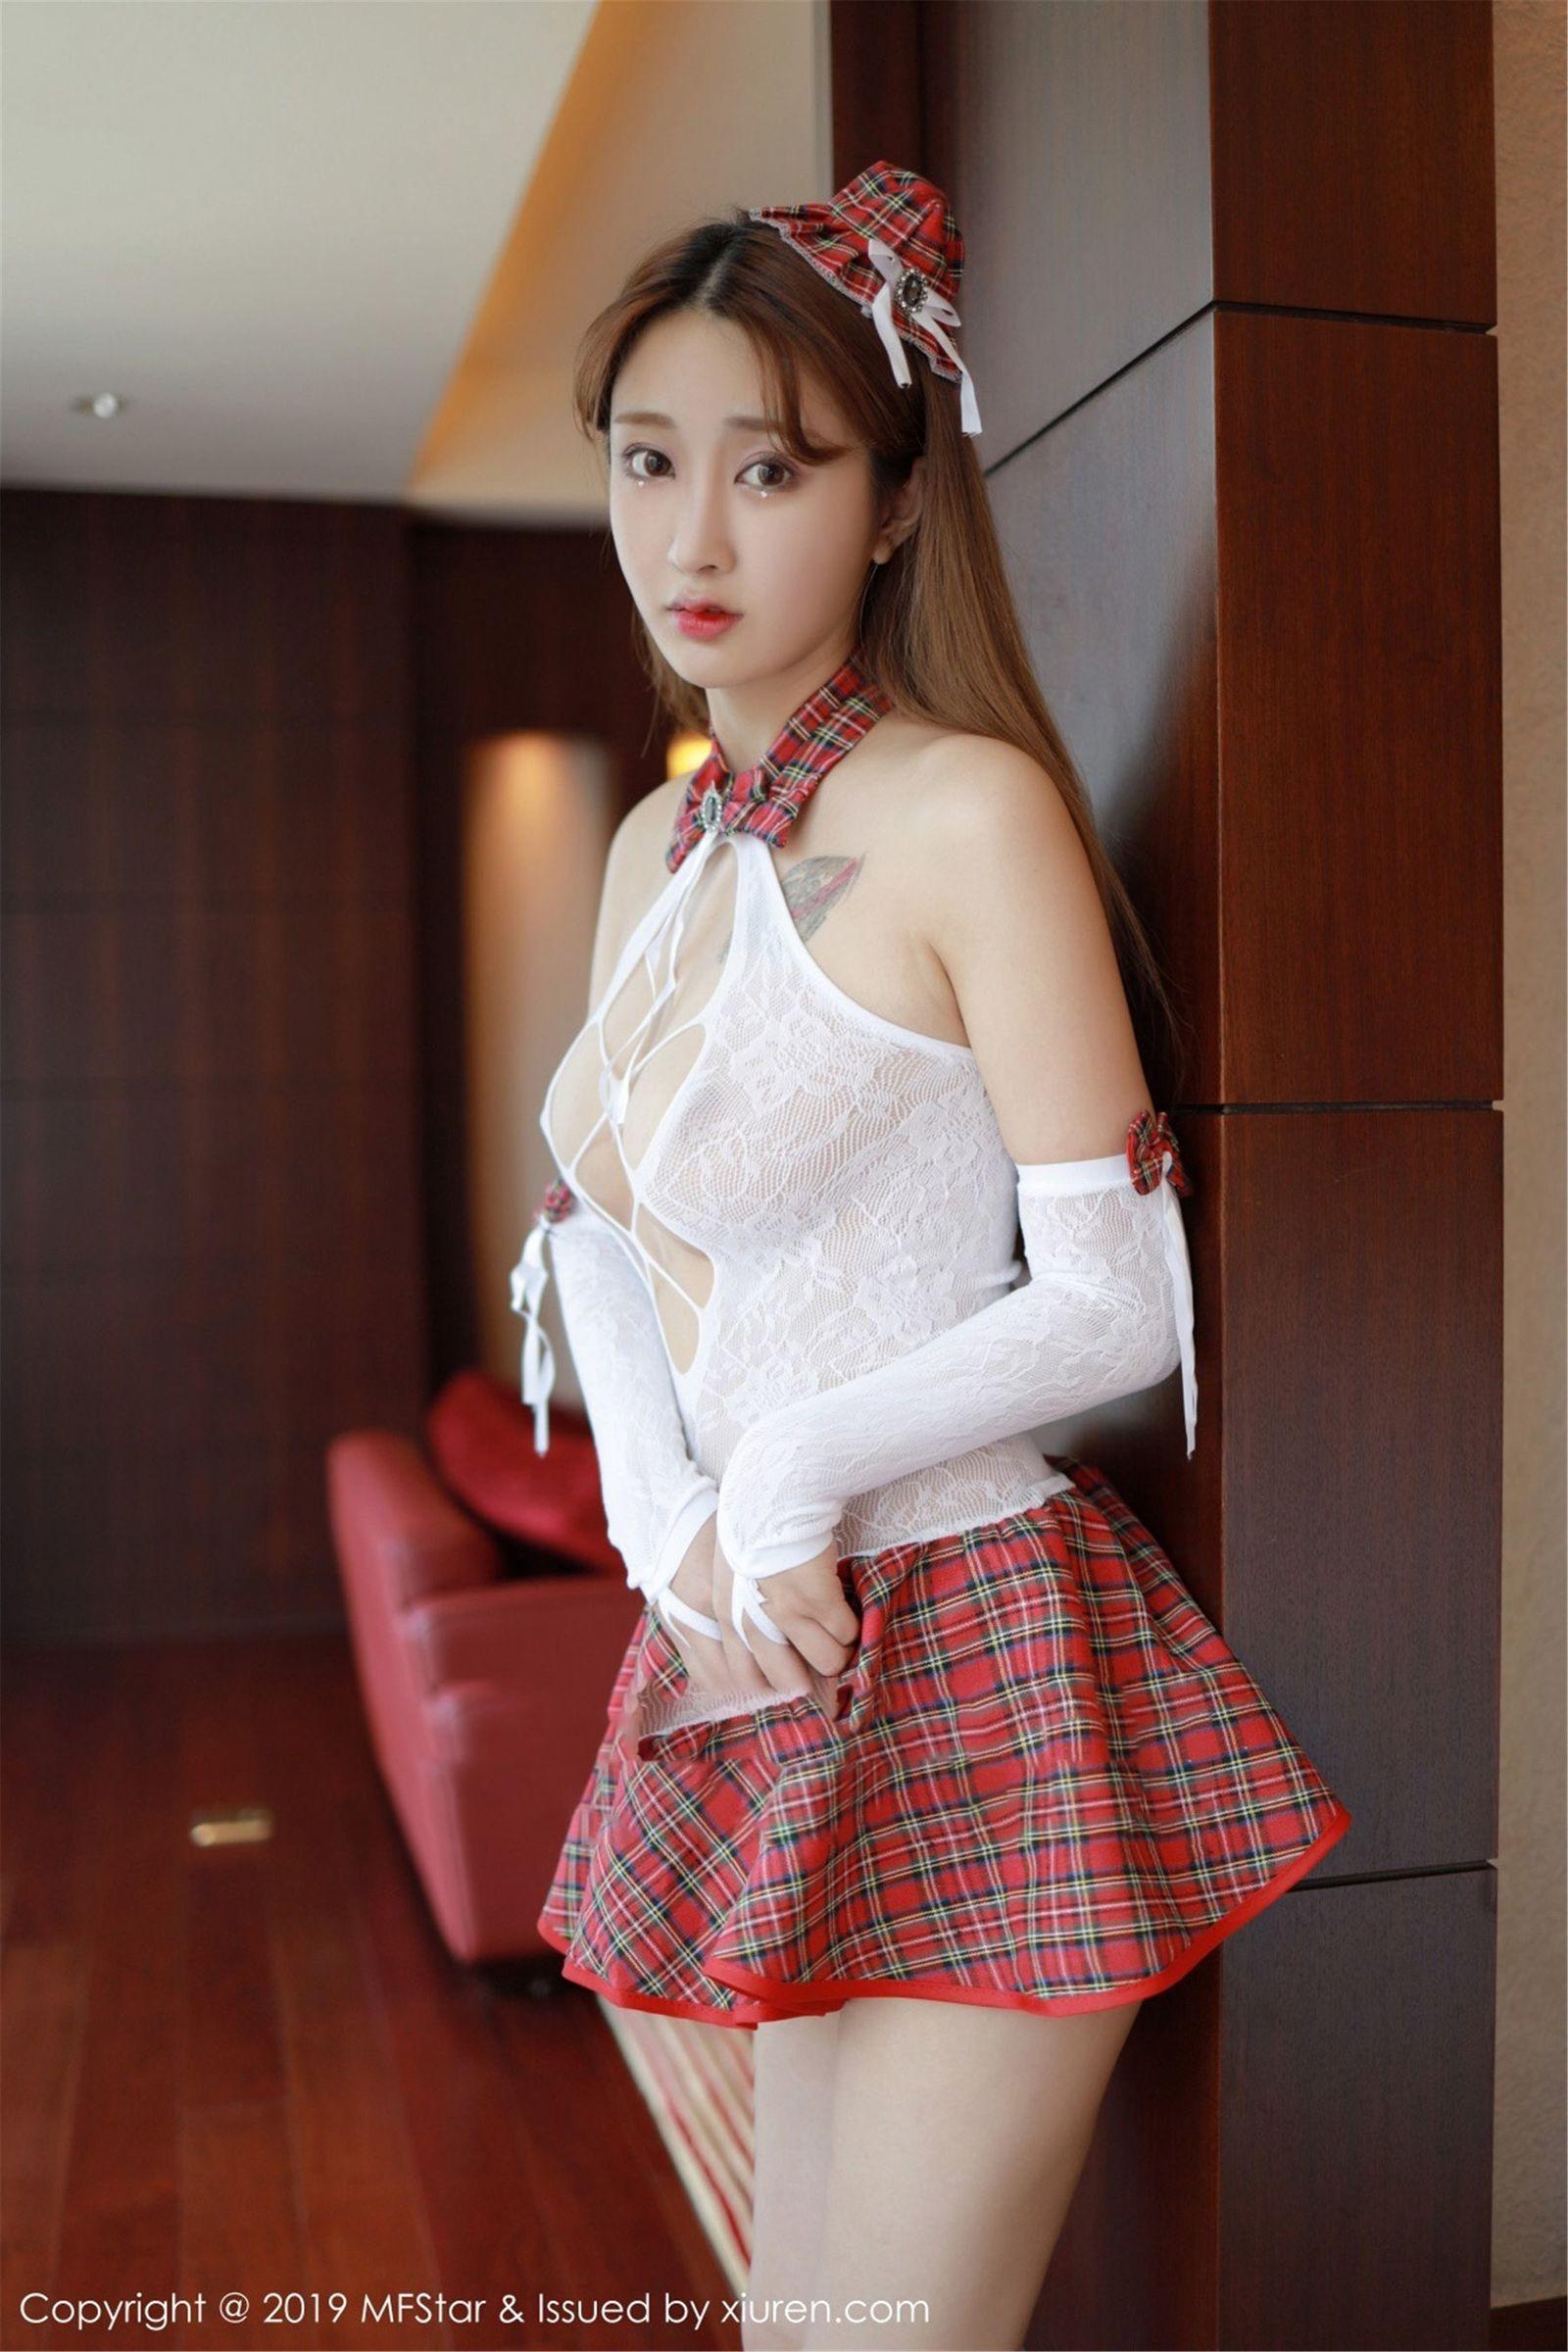 [MFStar模范学院] Vol.208 模特@Betty林子欣 - 学生制服[43P]